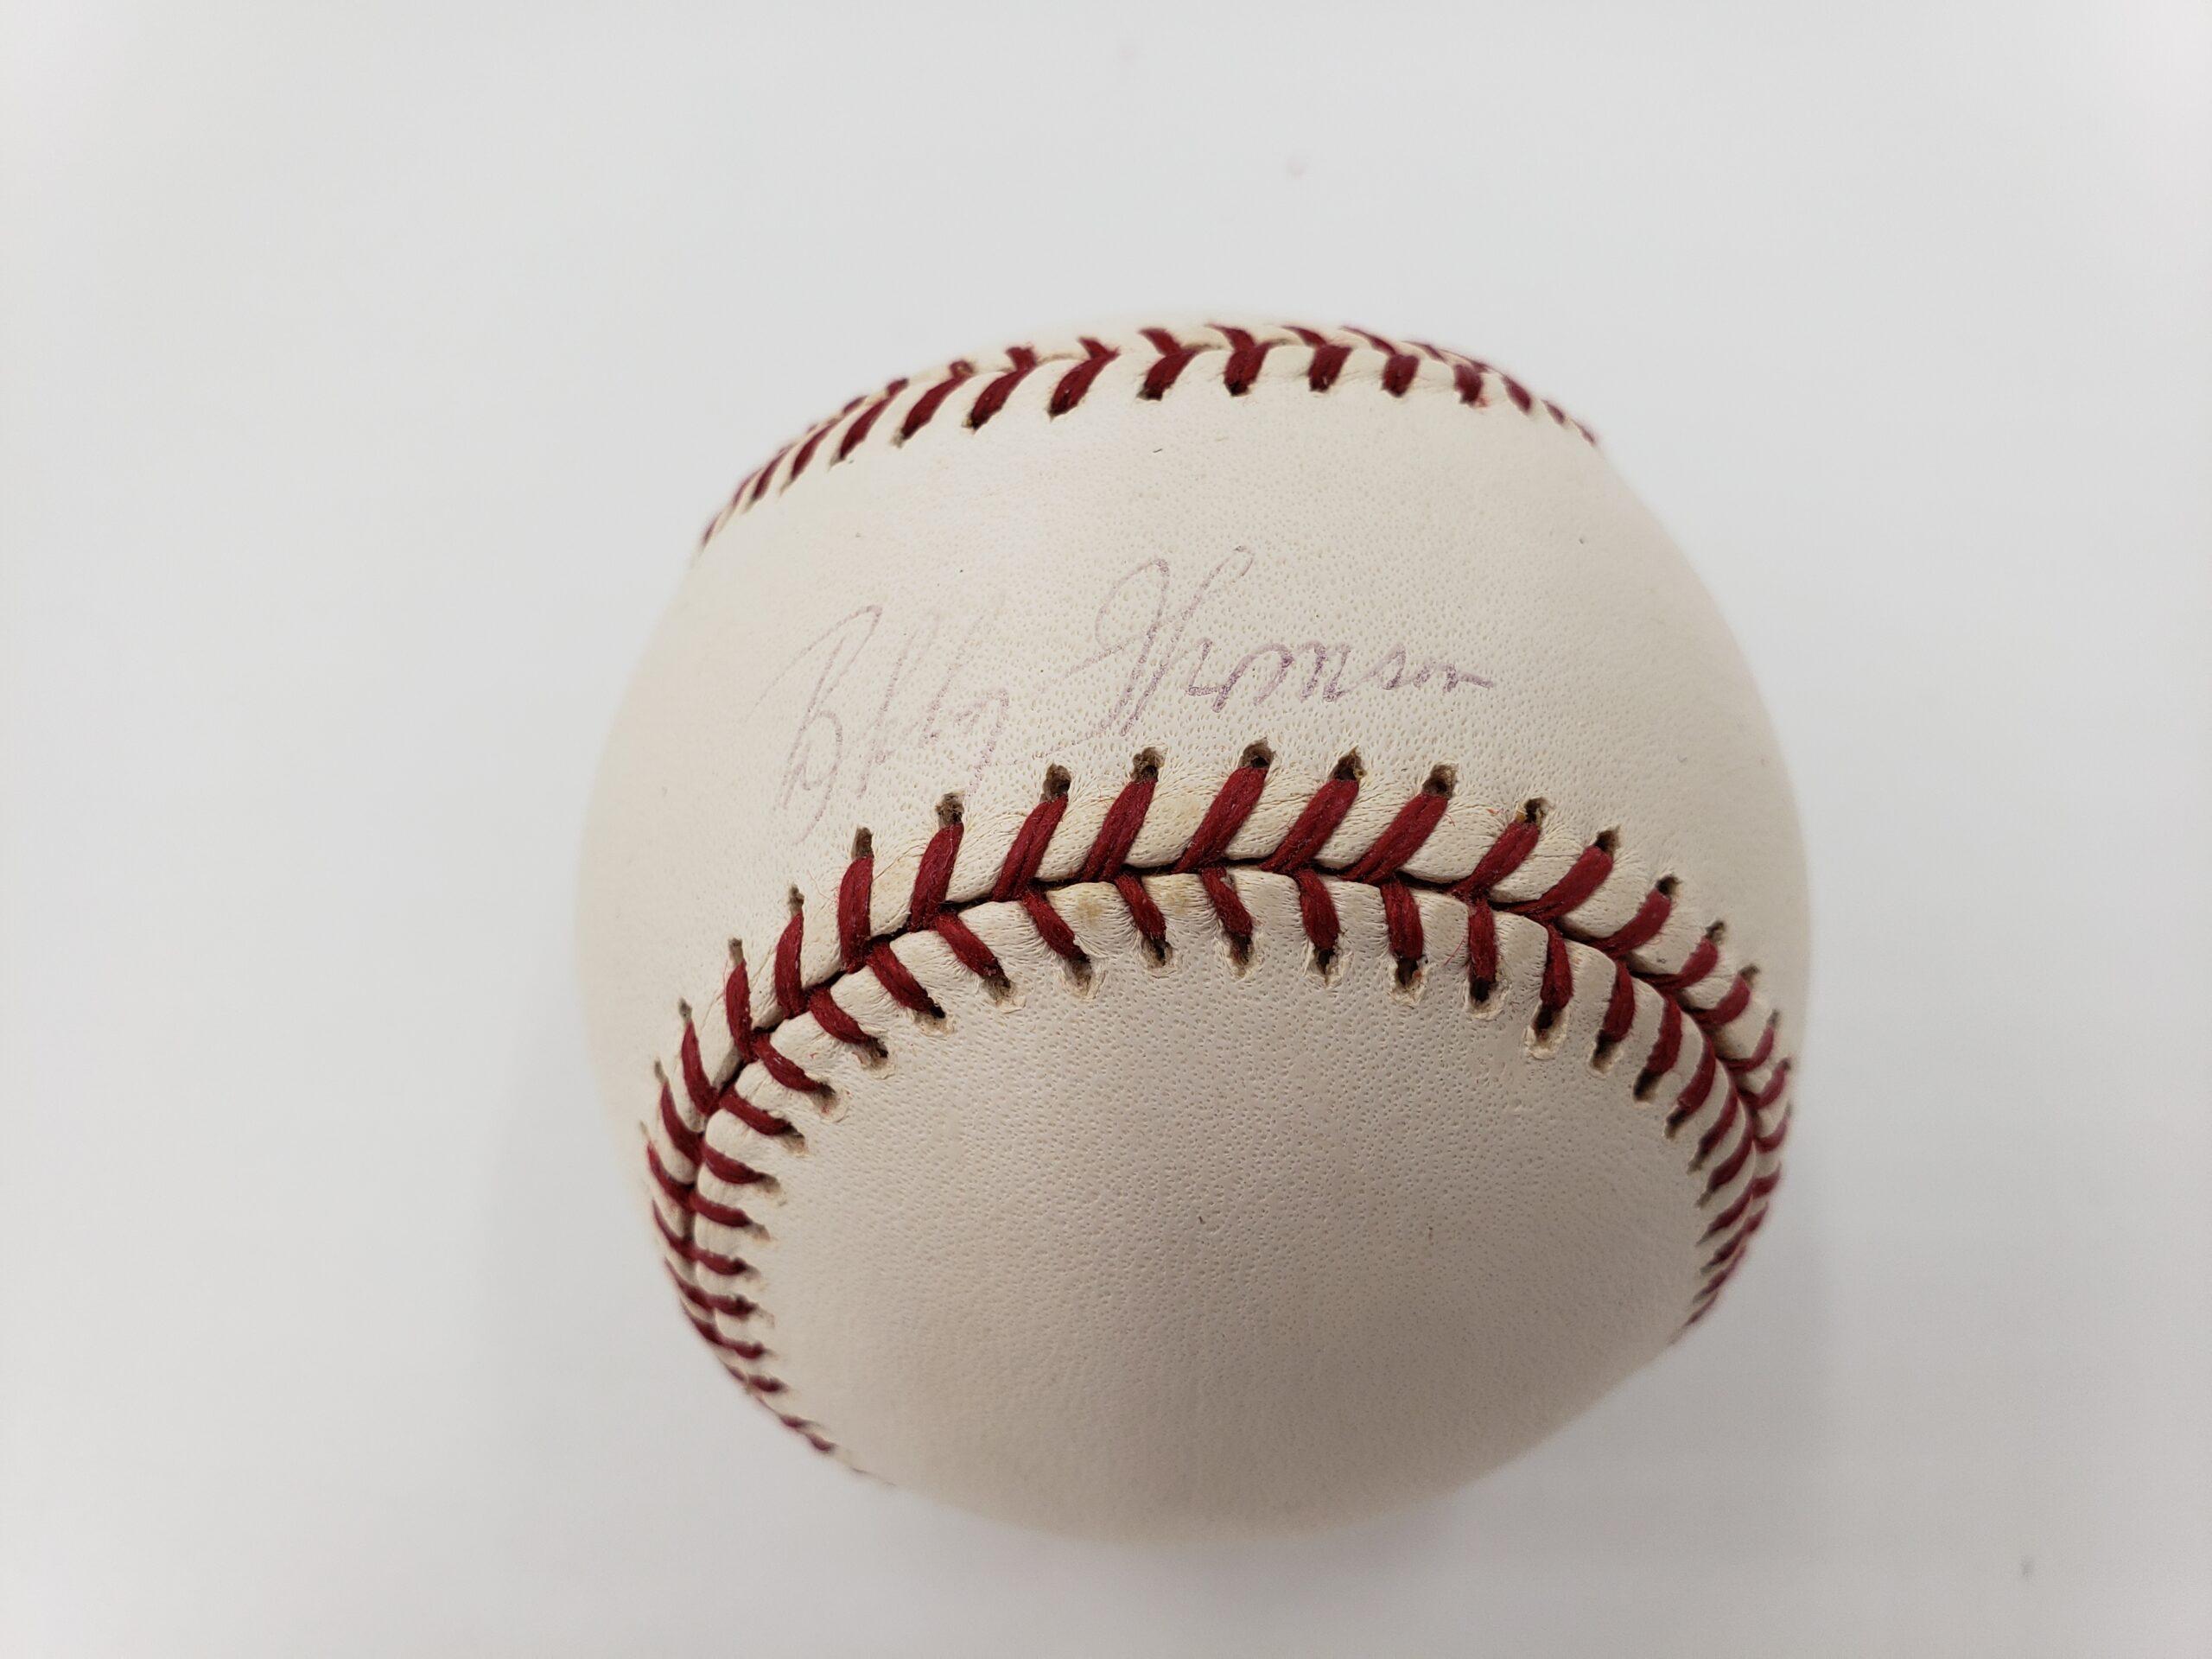 Bobby Thomson Autographed Baseball